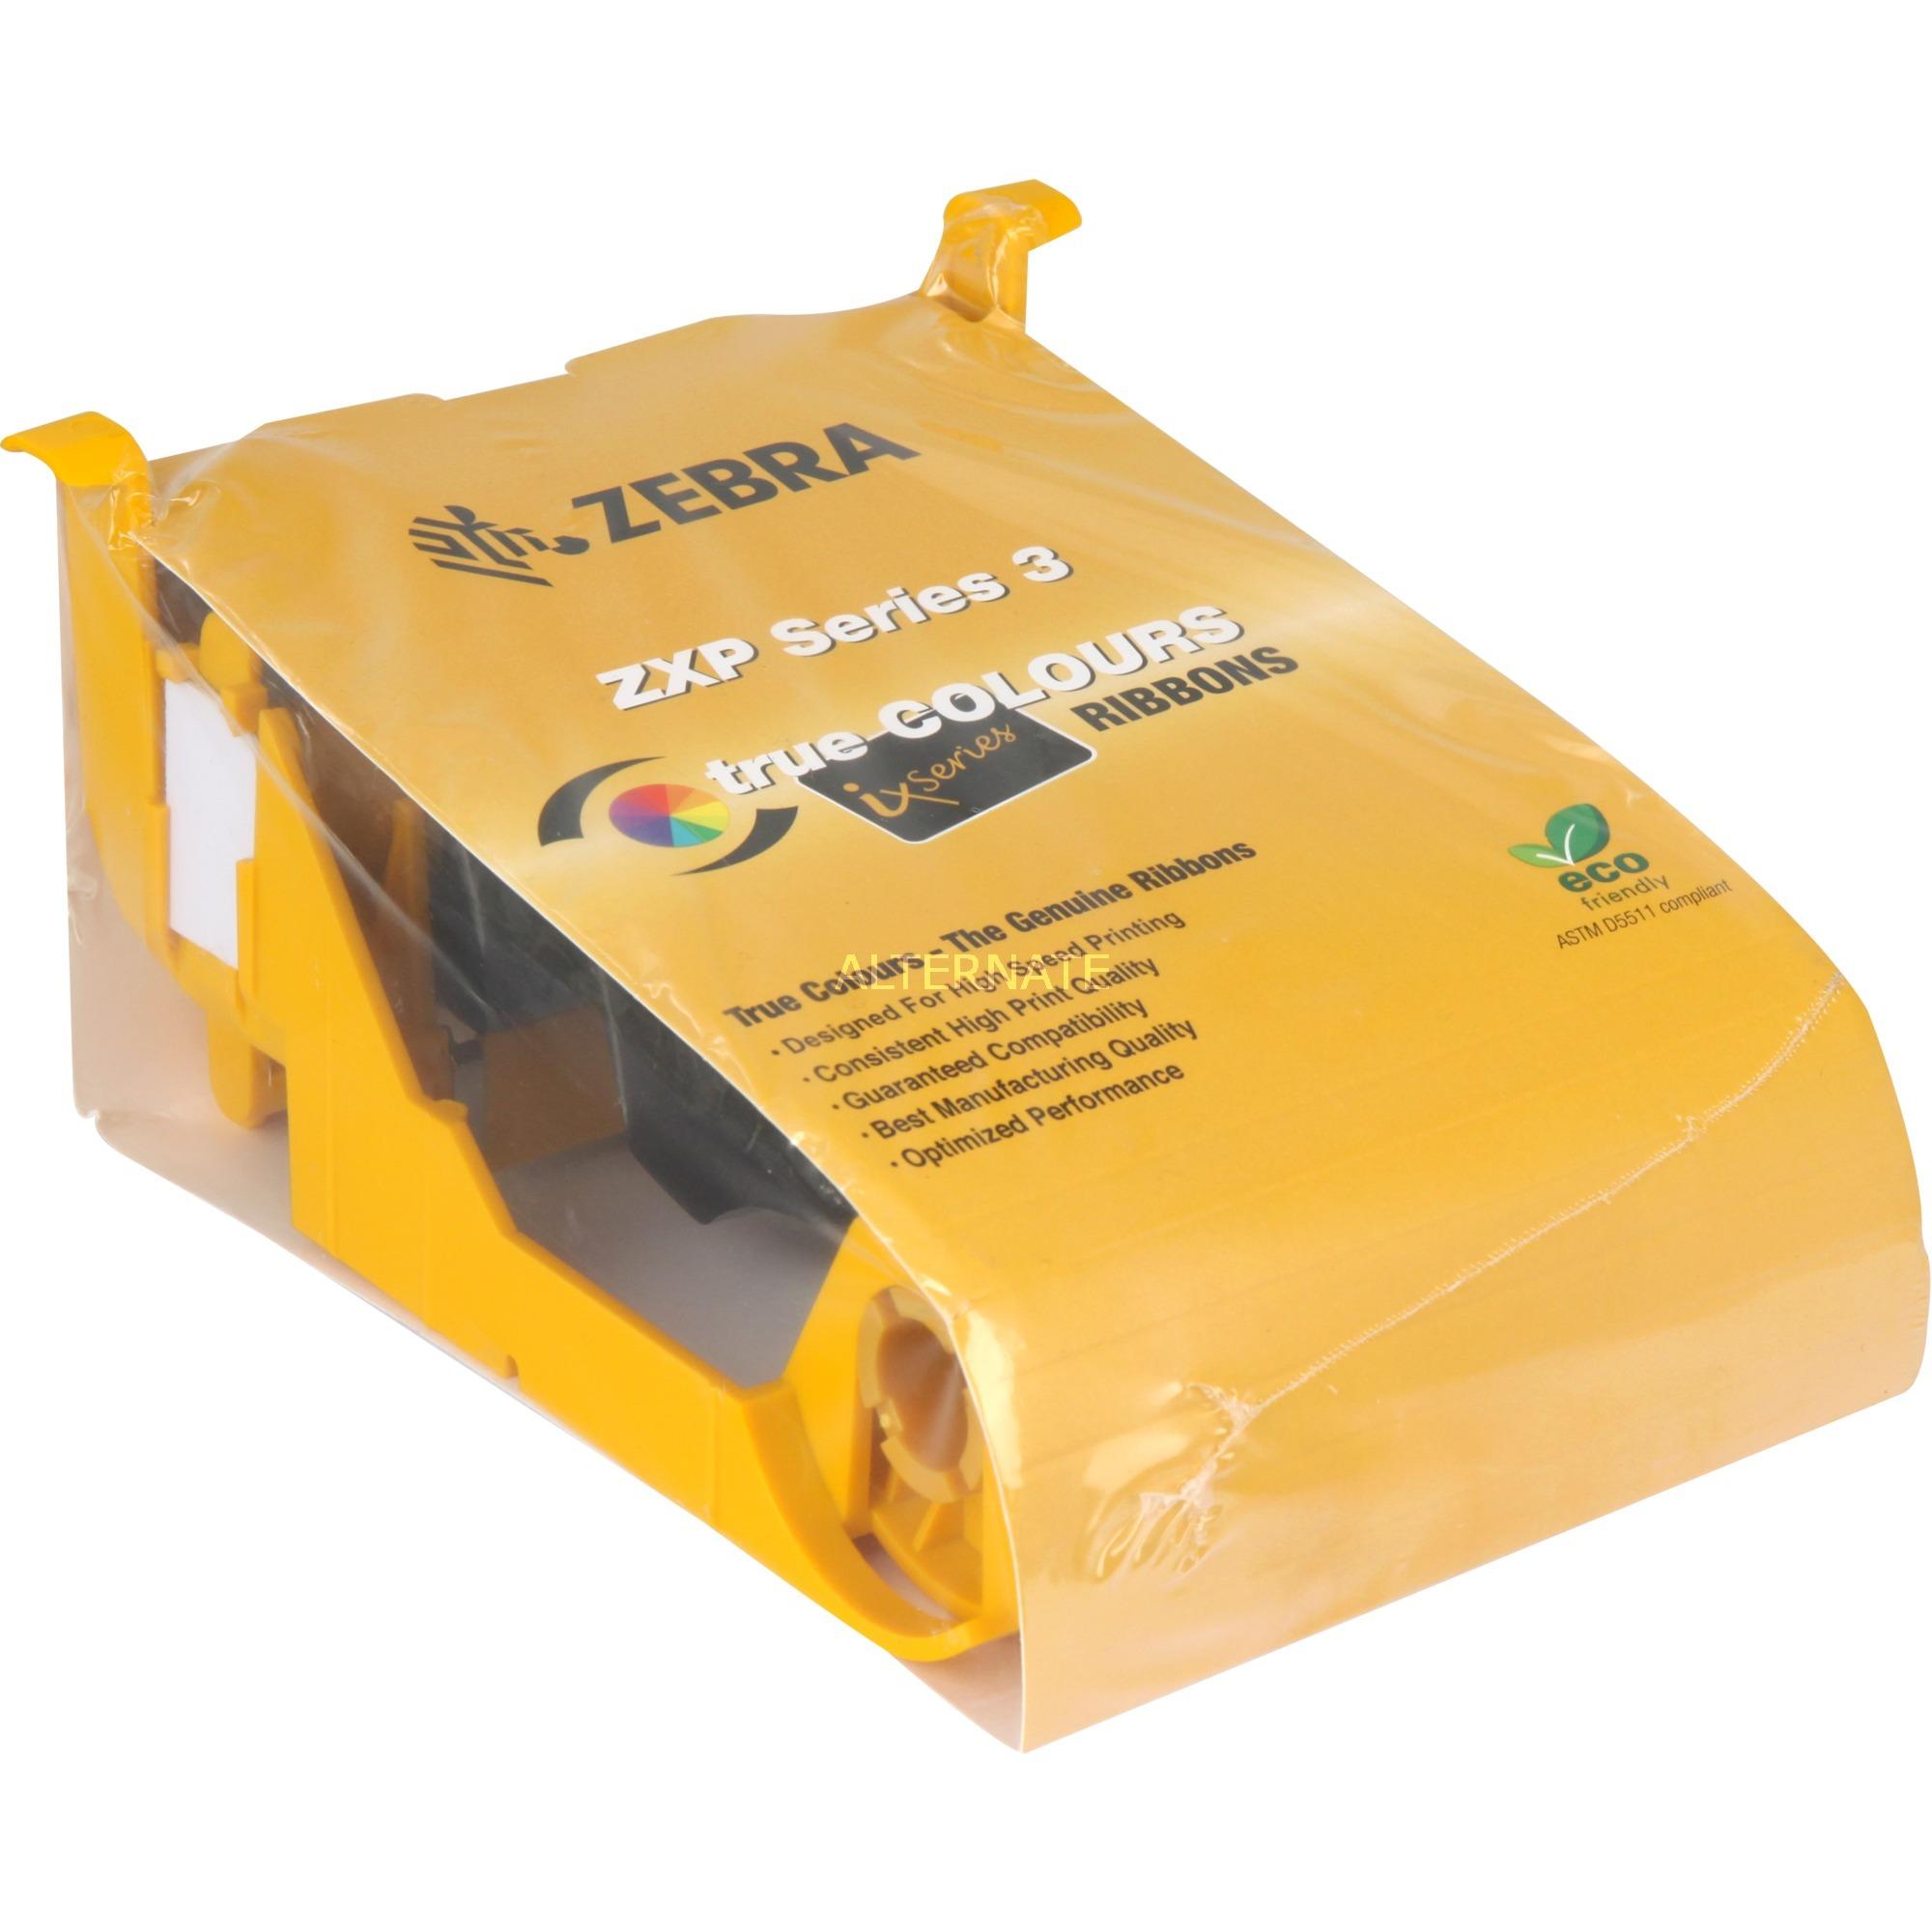 800033-801 cinta para impresora, Cinta de colores